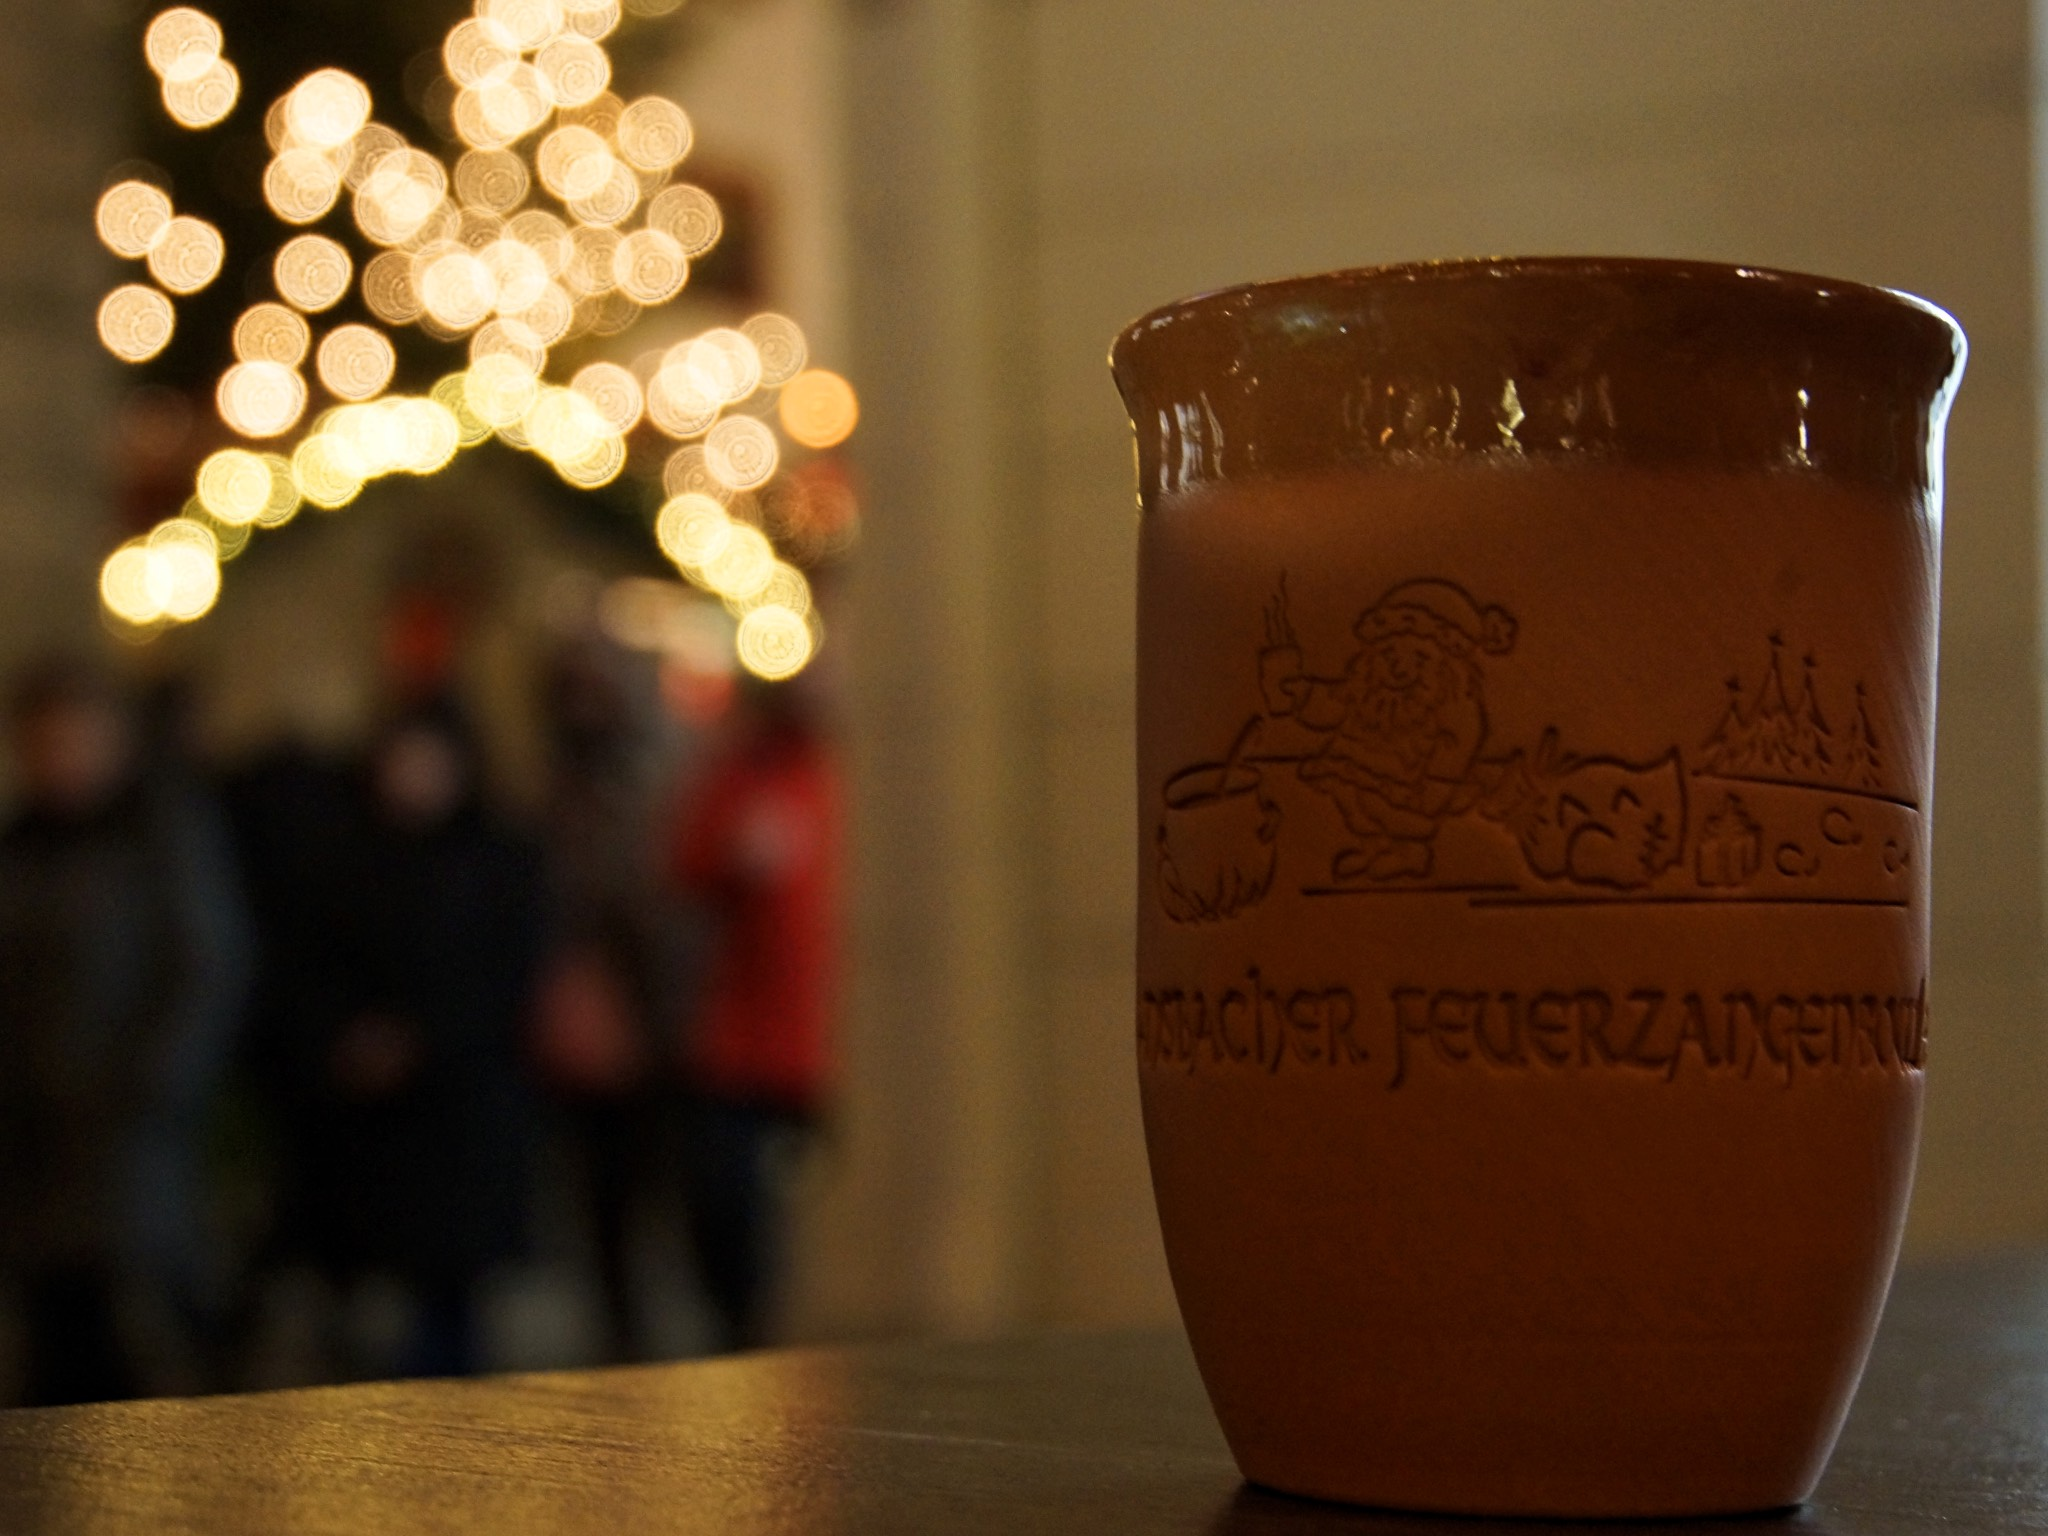 Ansbacher Feuerzangenbowle. Foto: Barbara Duna